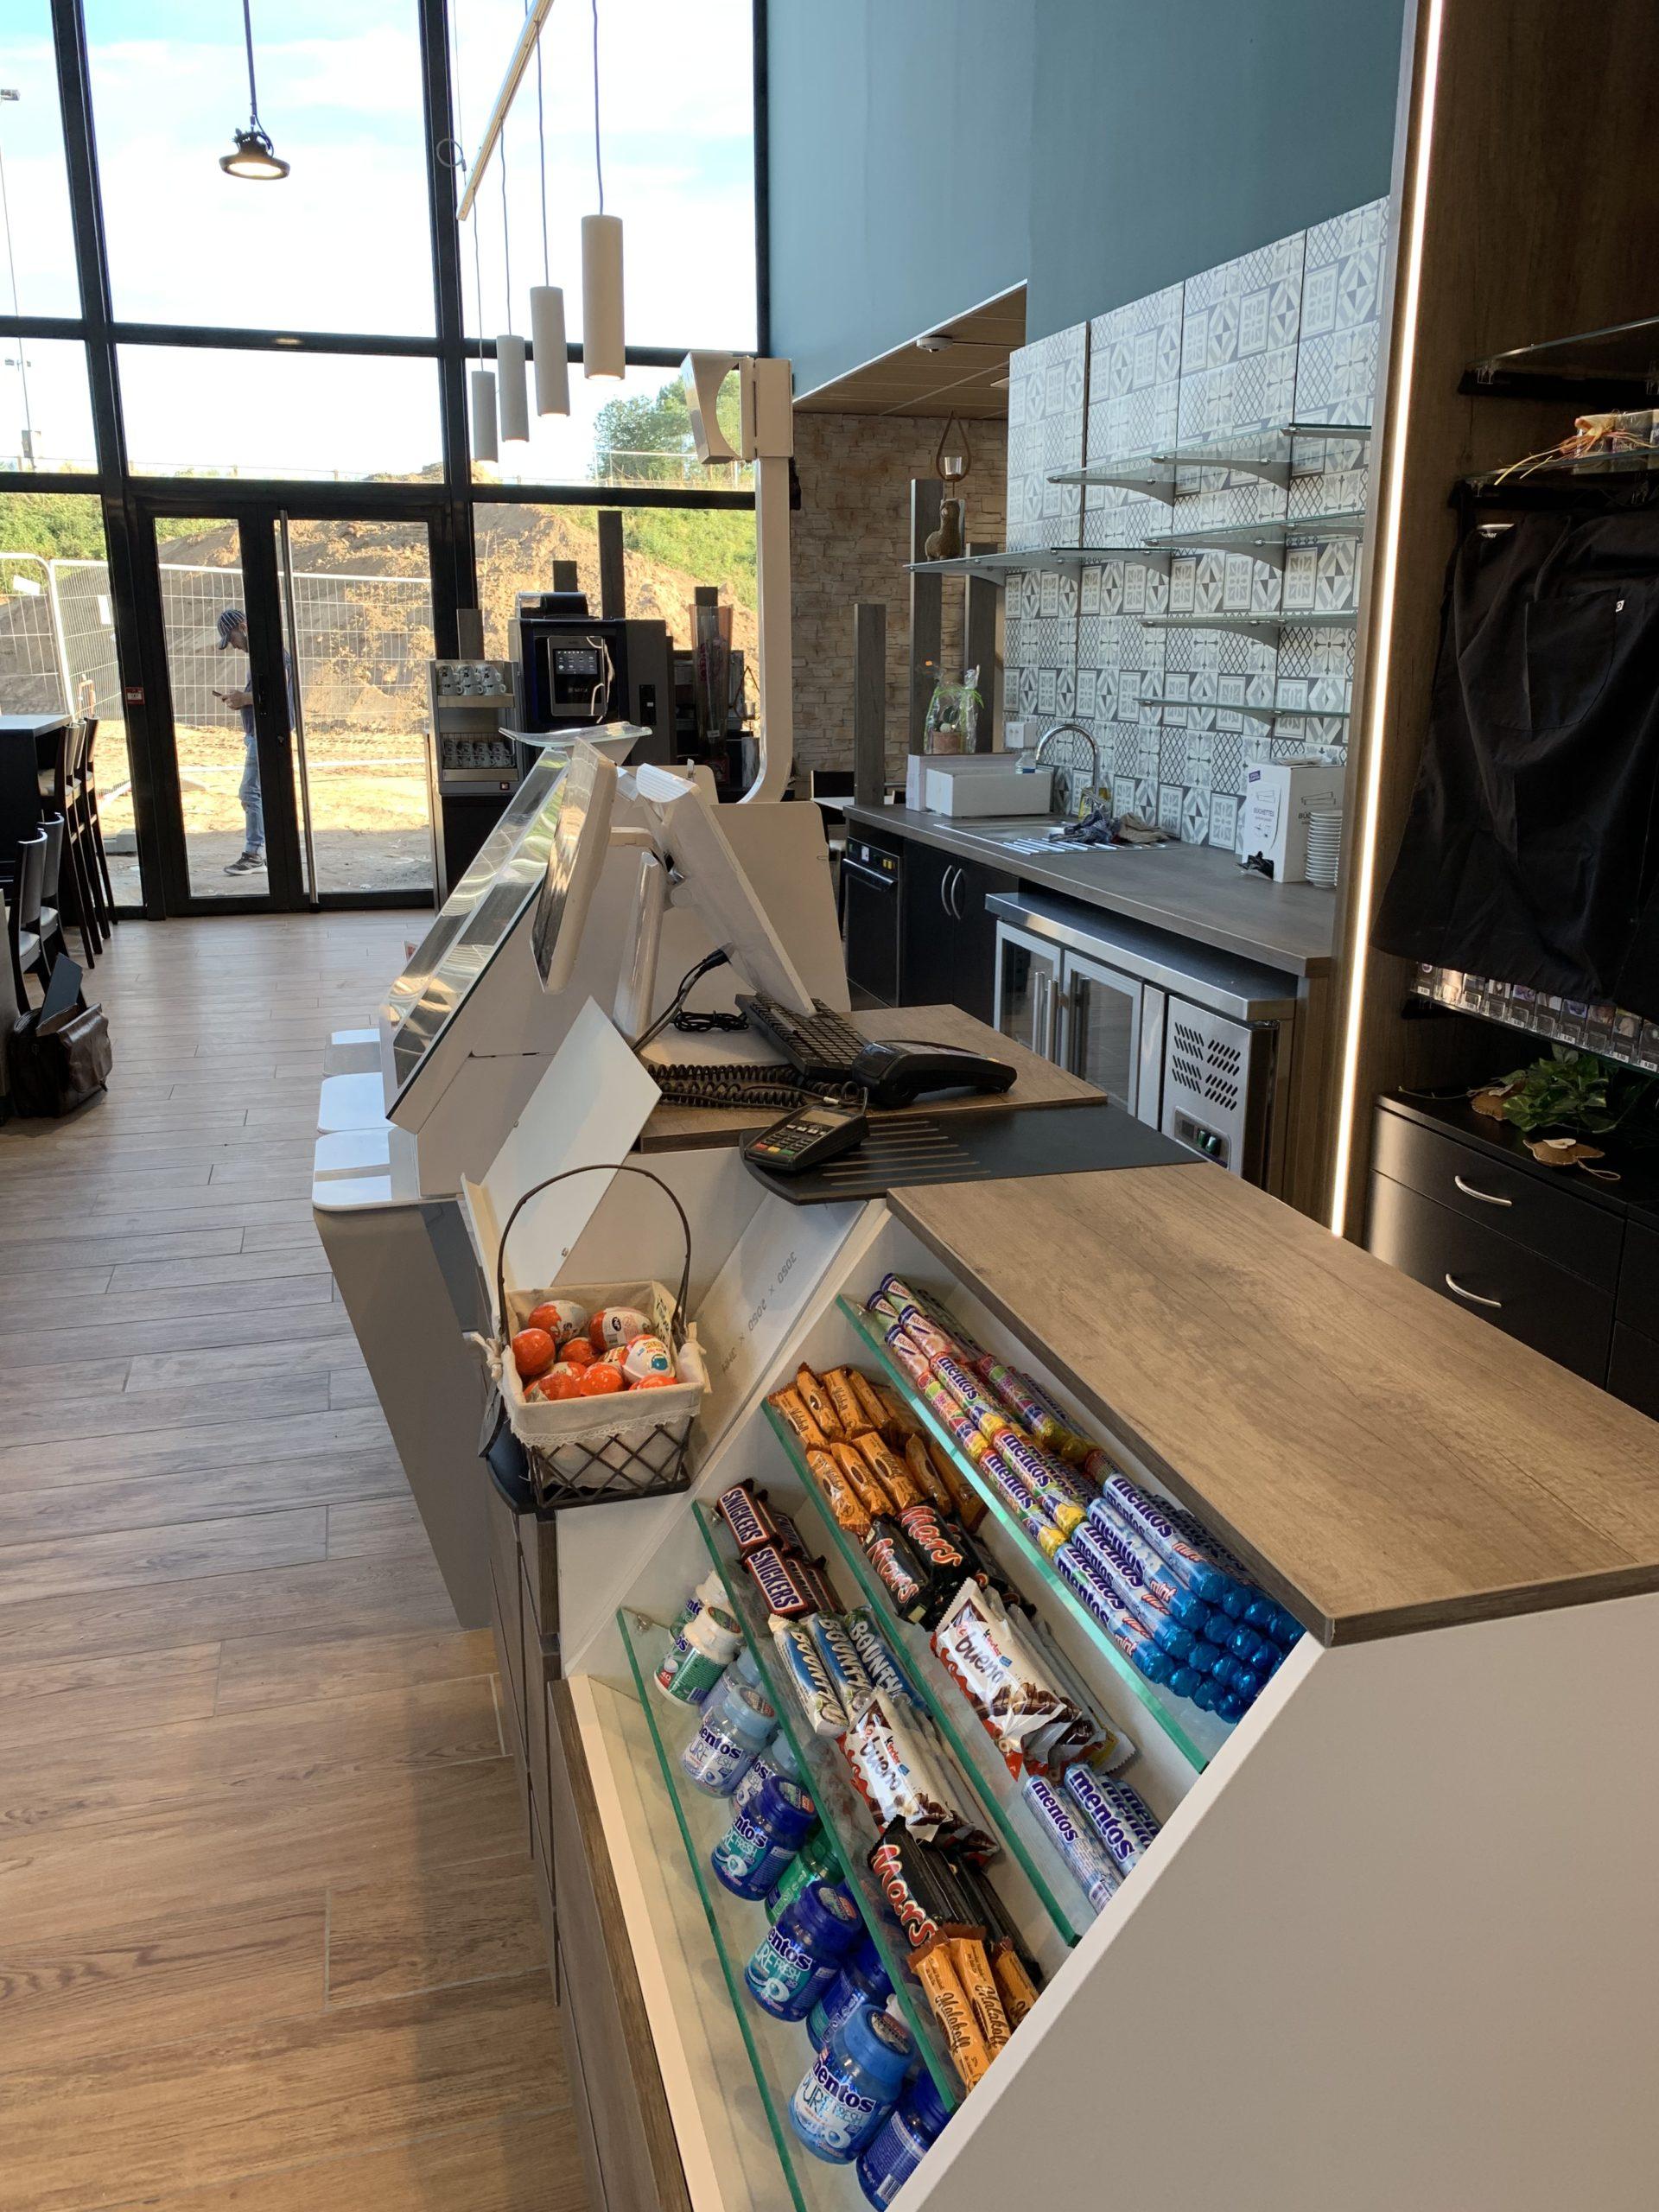 comptoir confiserie et comptoirs caisse tabac presse alsace seebach / a2m diffusion